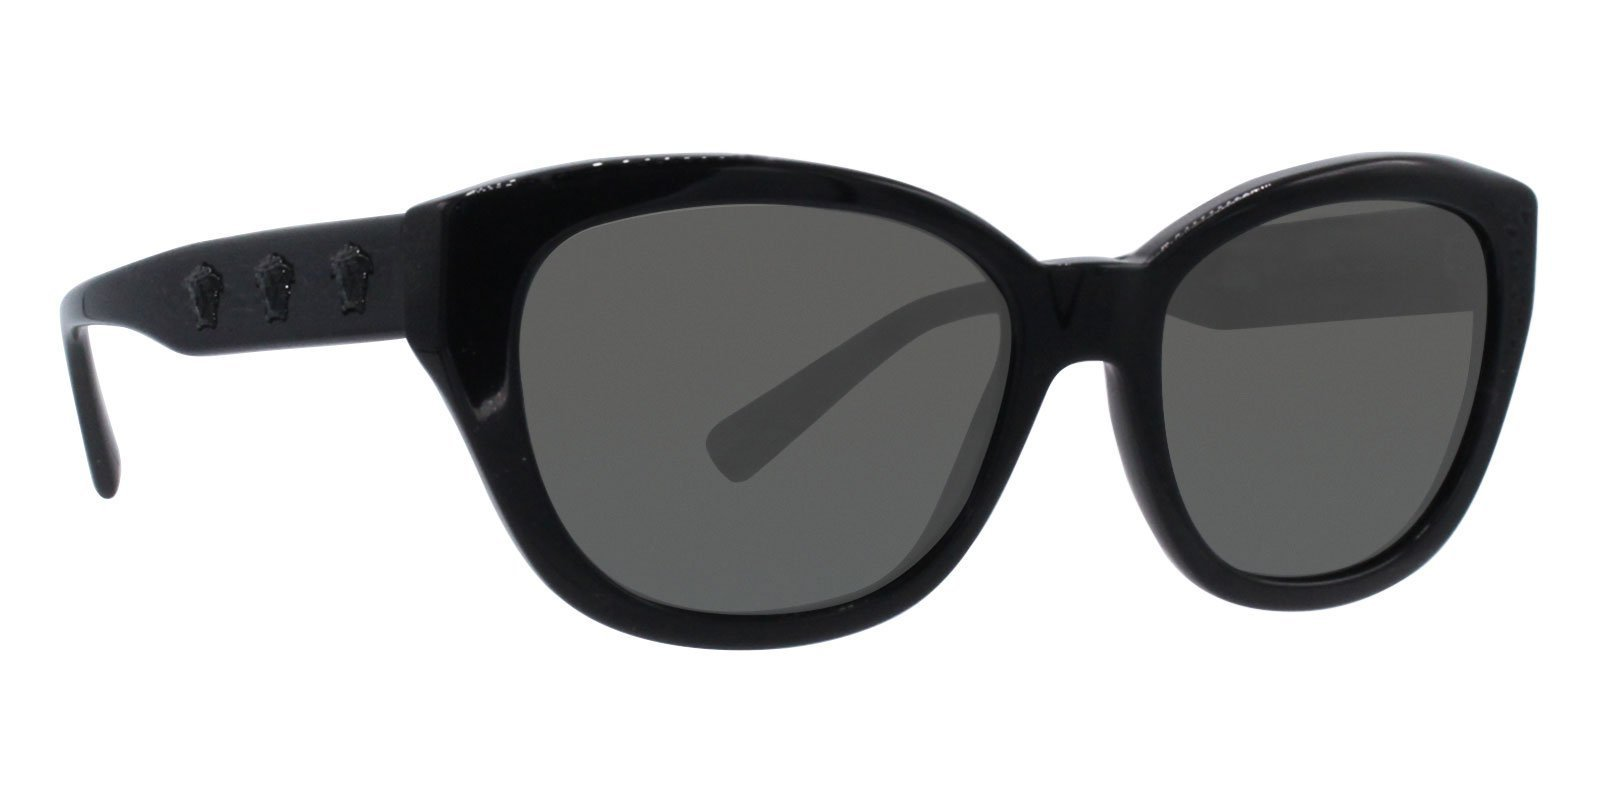 84f1797630ec7 Versace - VE4343 Black - Gray-sunglasses-Designer Eyes